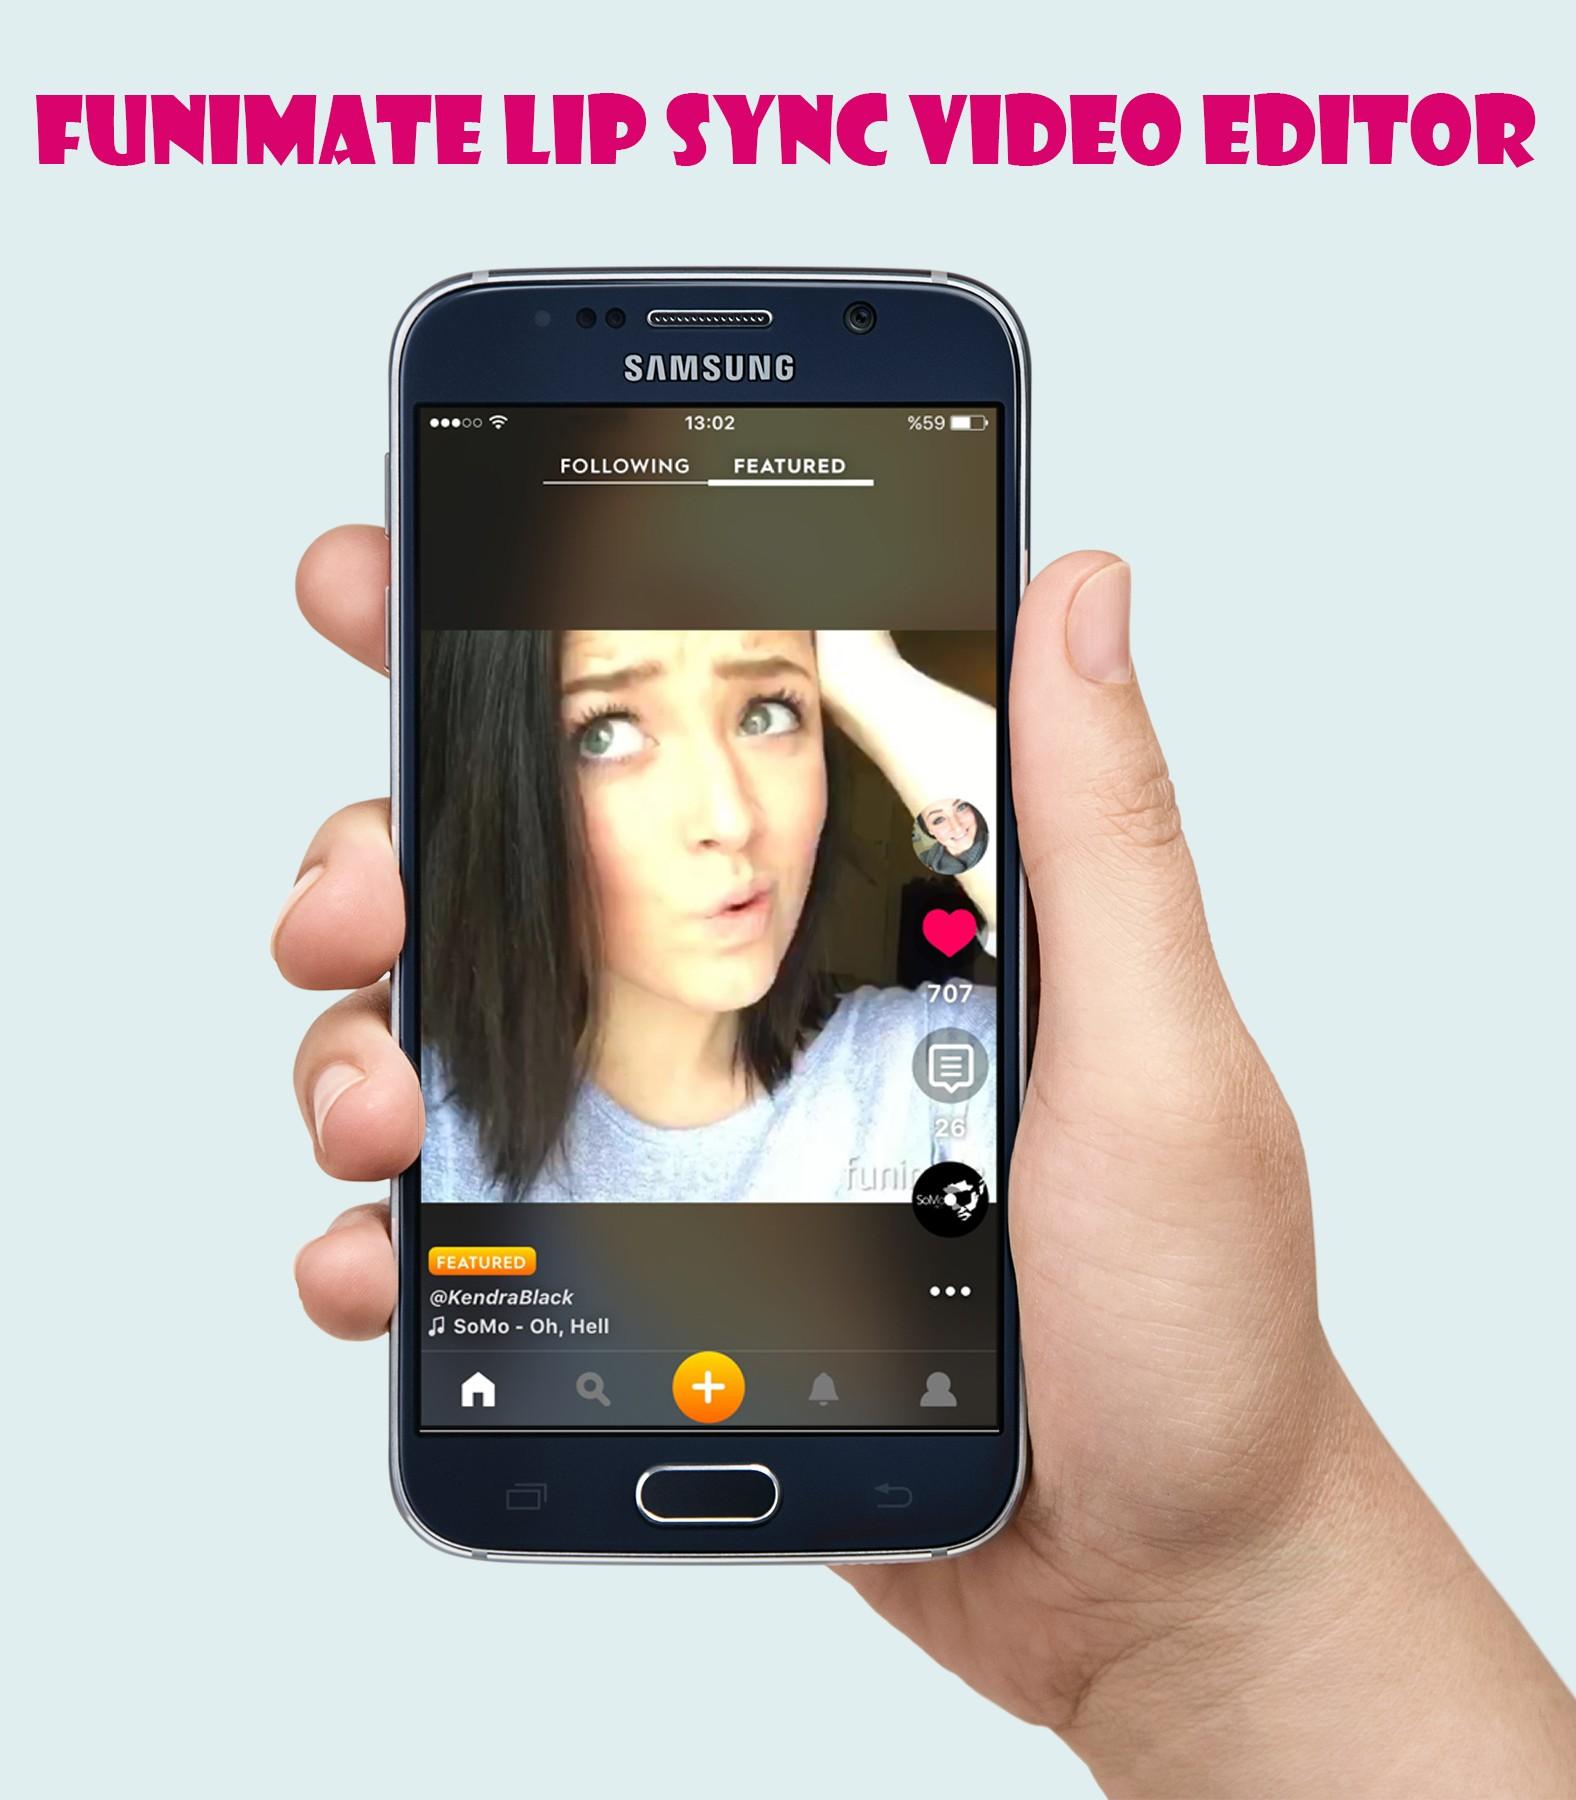 Funimate Lip Sync Video Editor